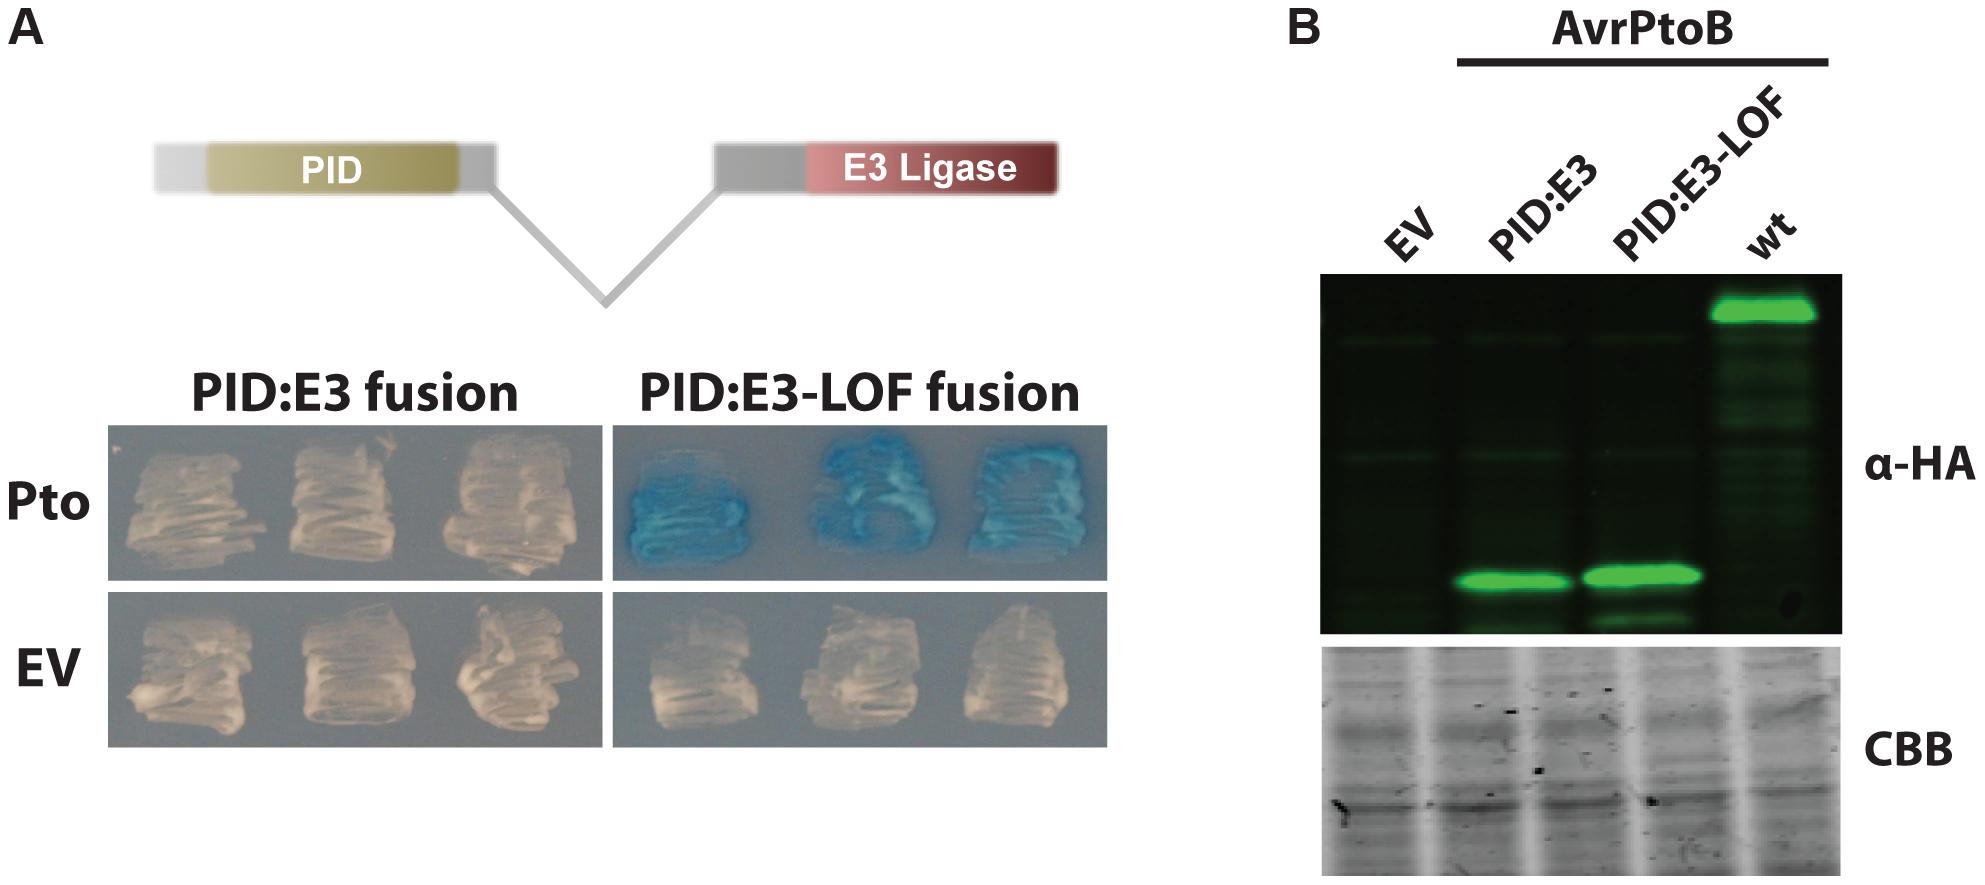 AvrPtoB mediates Pto degradation if the kinase is positioned closer to the AvrPtoB E3 ligase.